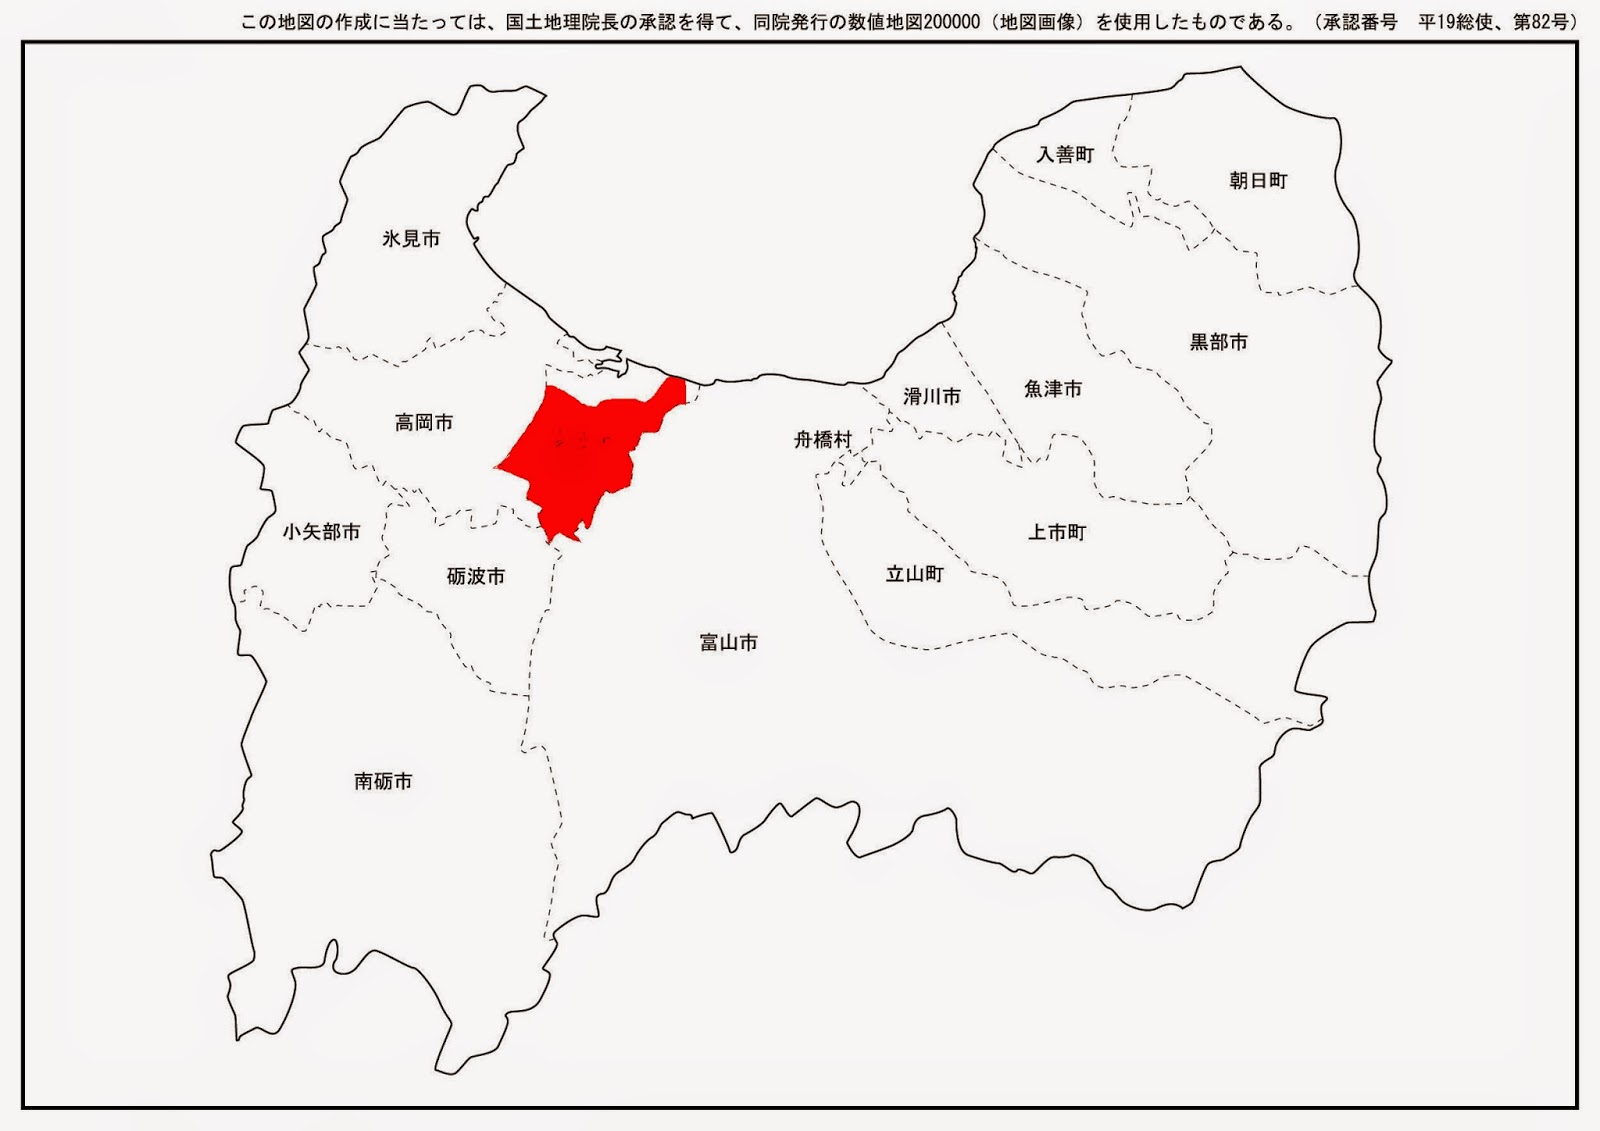 dryascw: ○ファースト射水郡 (JC...